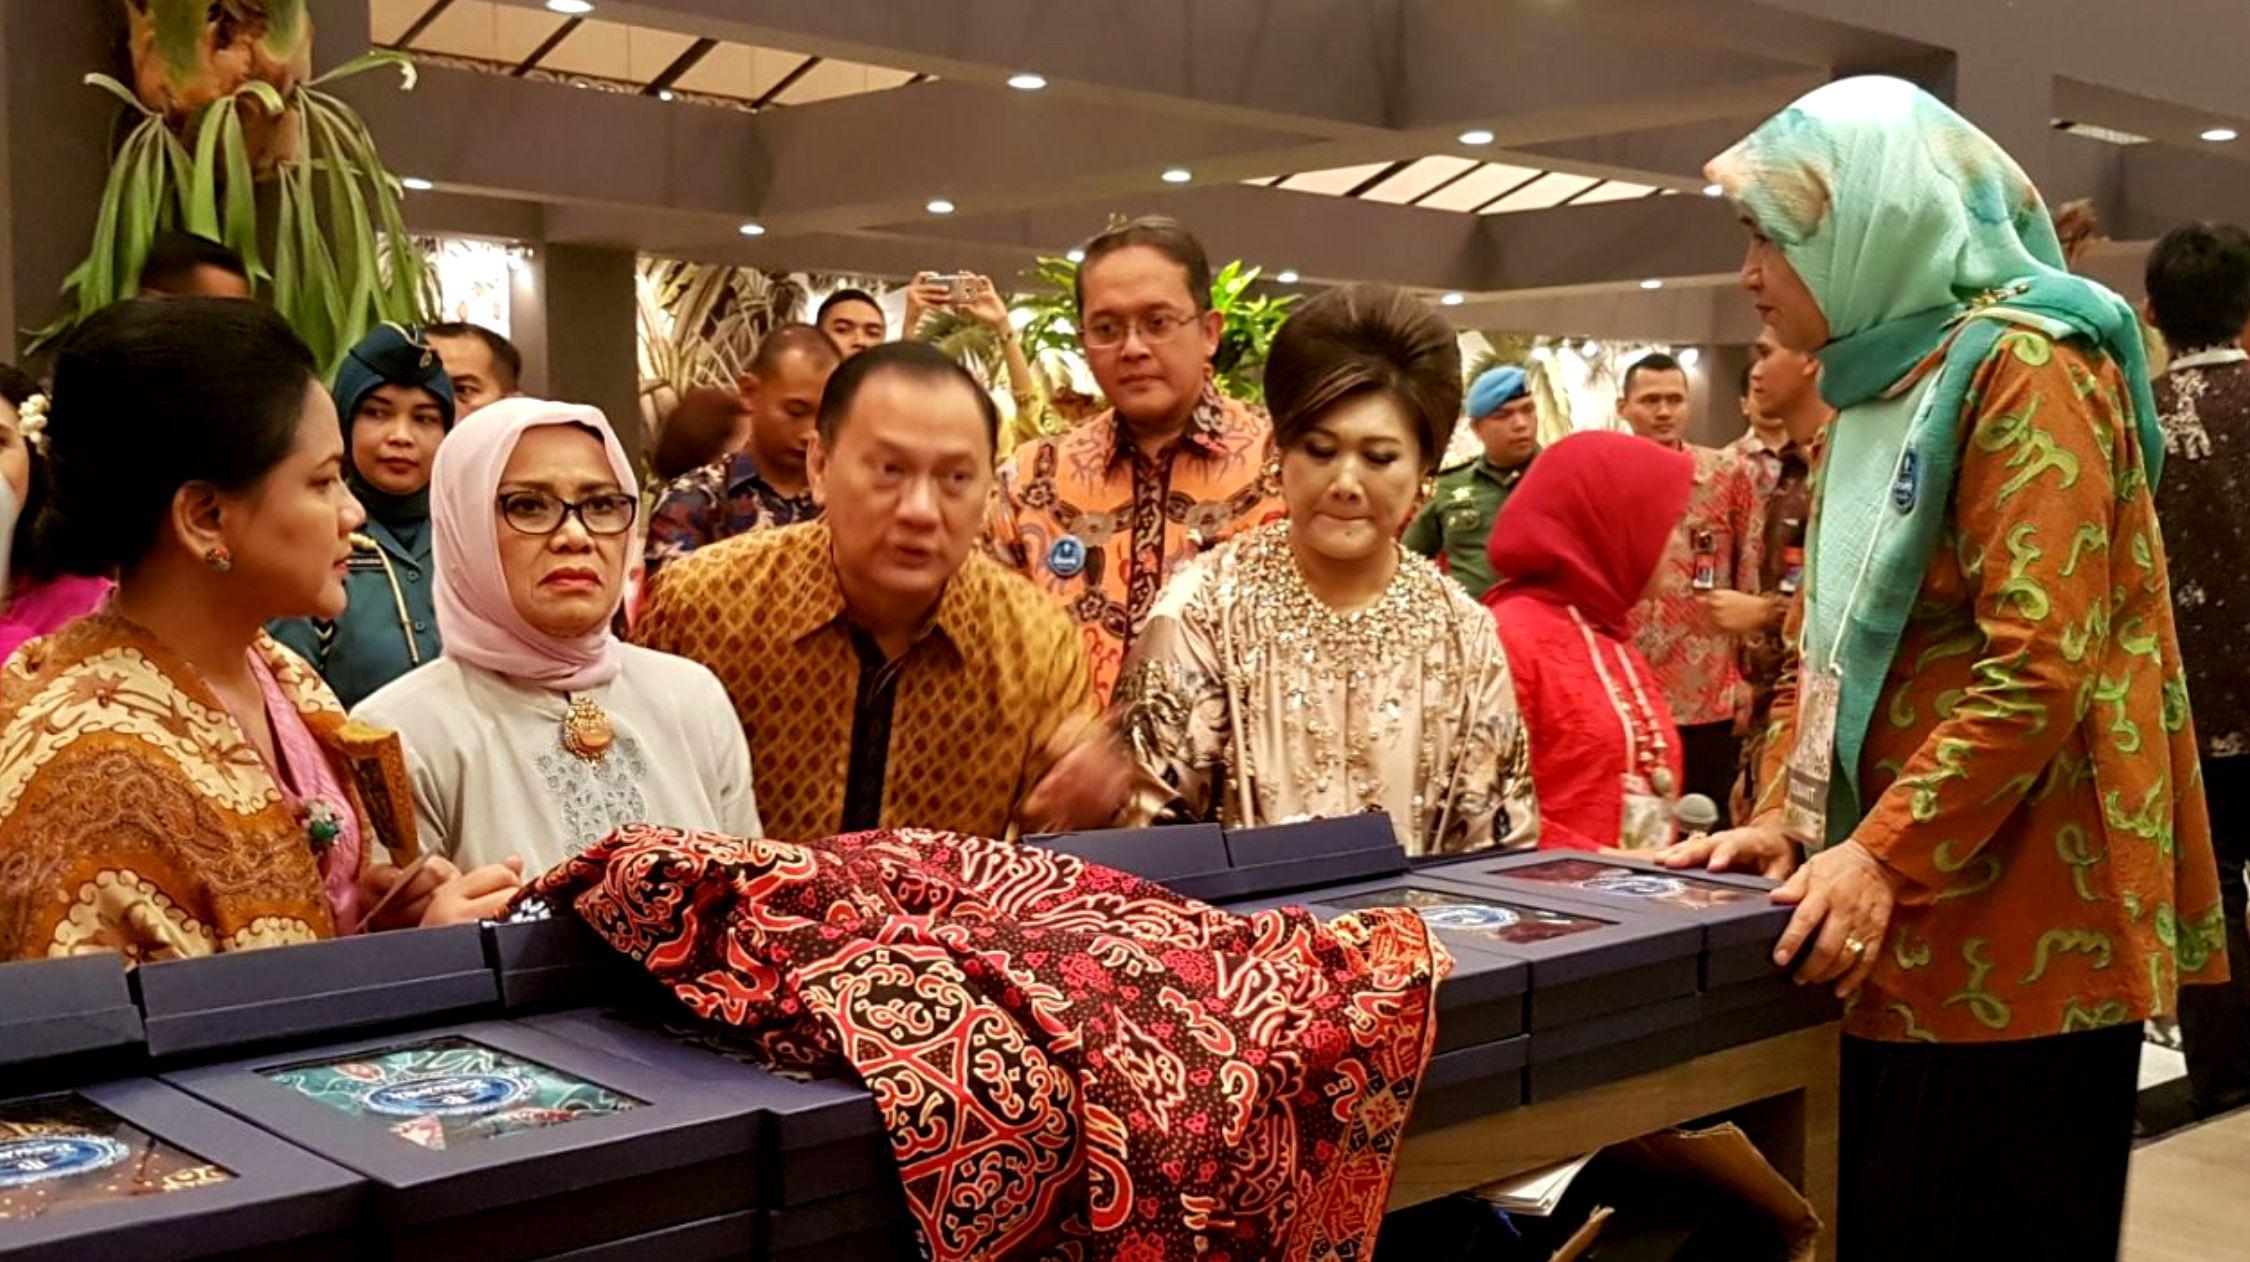 Ibu negara Iriana Jokowi dan istri wakil presiden Mufida Jusuf Kalla saat mengunjungi stand Batik Kain Besurek Bengkulu dalam Pameran Karya Kreatif Indonesia di Jakarta Convention Centre (Liputan6.com/Yuliardi Hardjo)